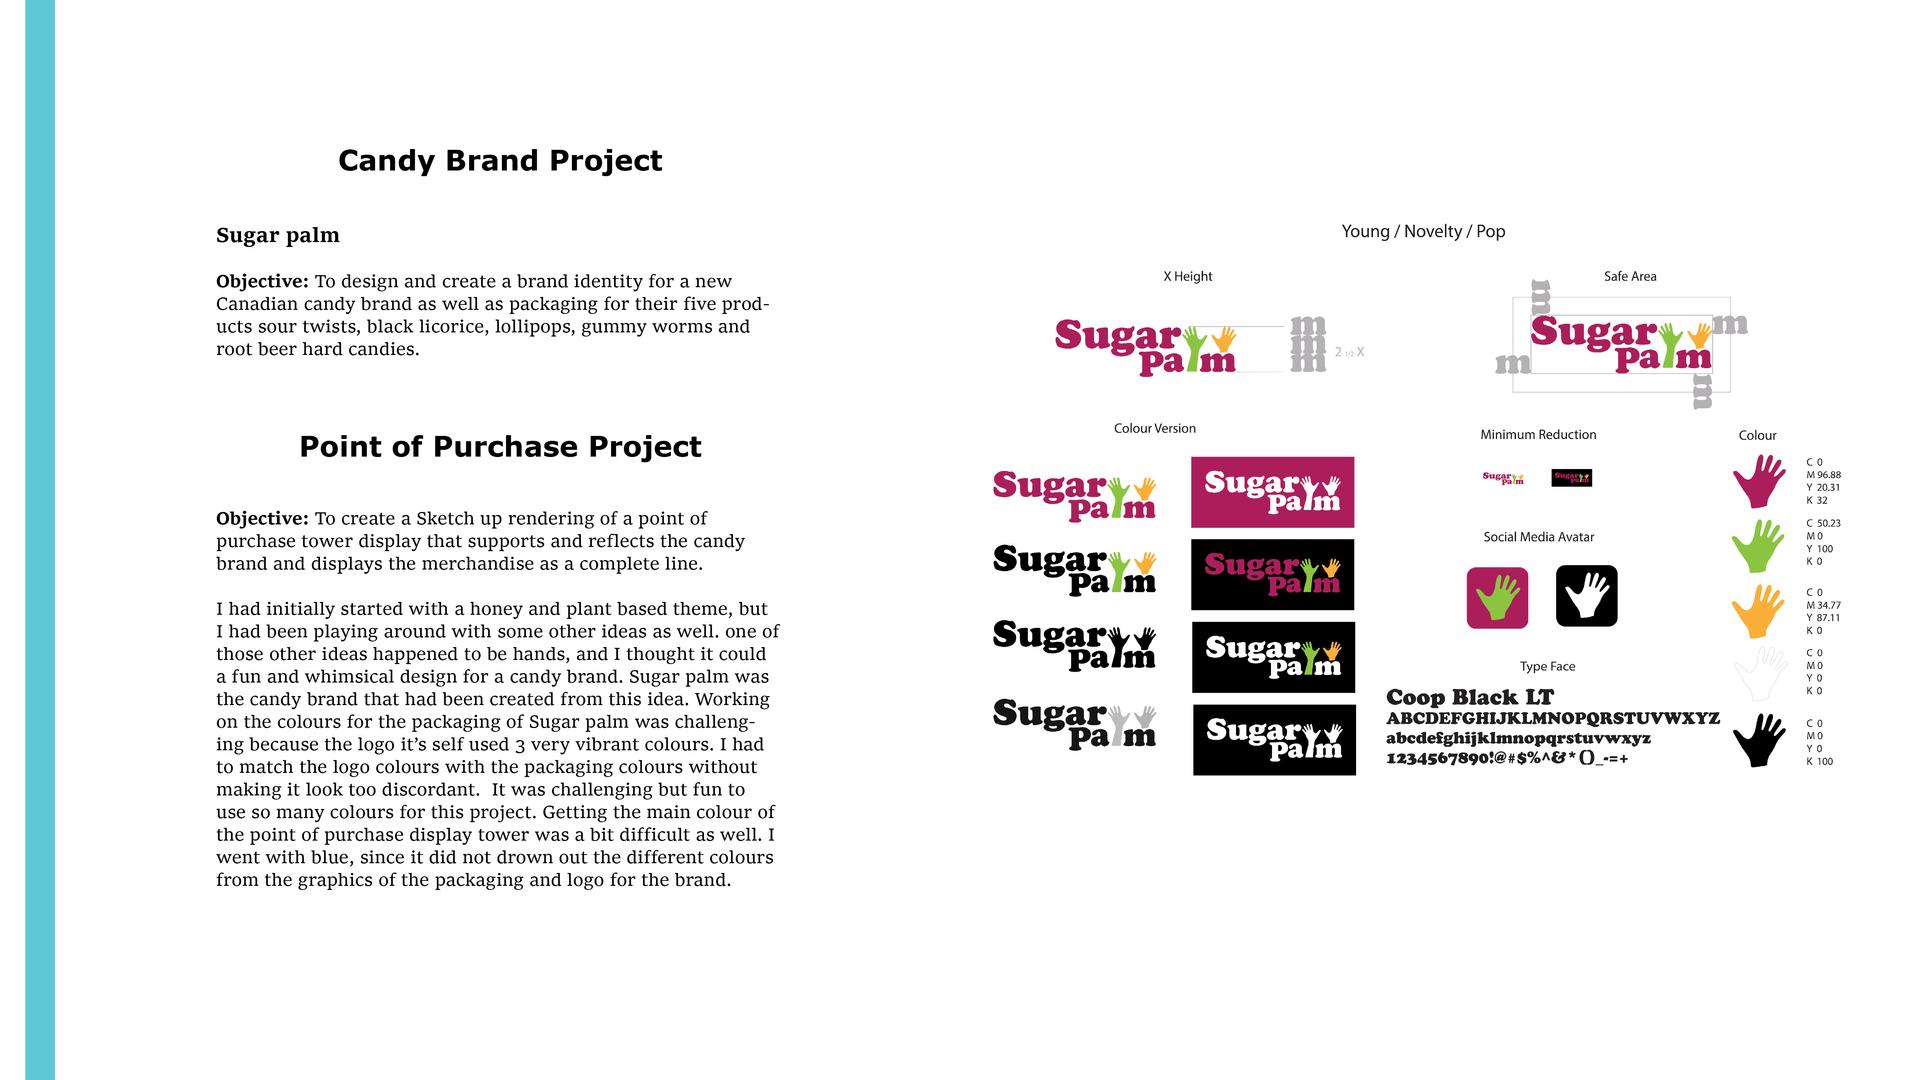 Candy brand Sugar palm brand standards